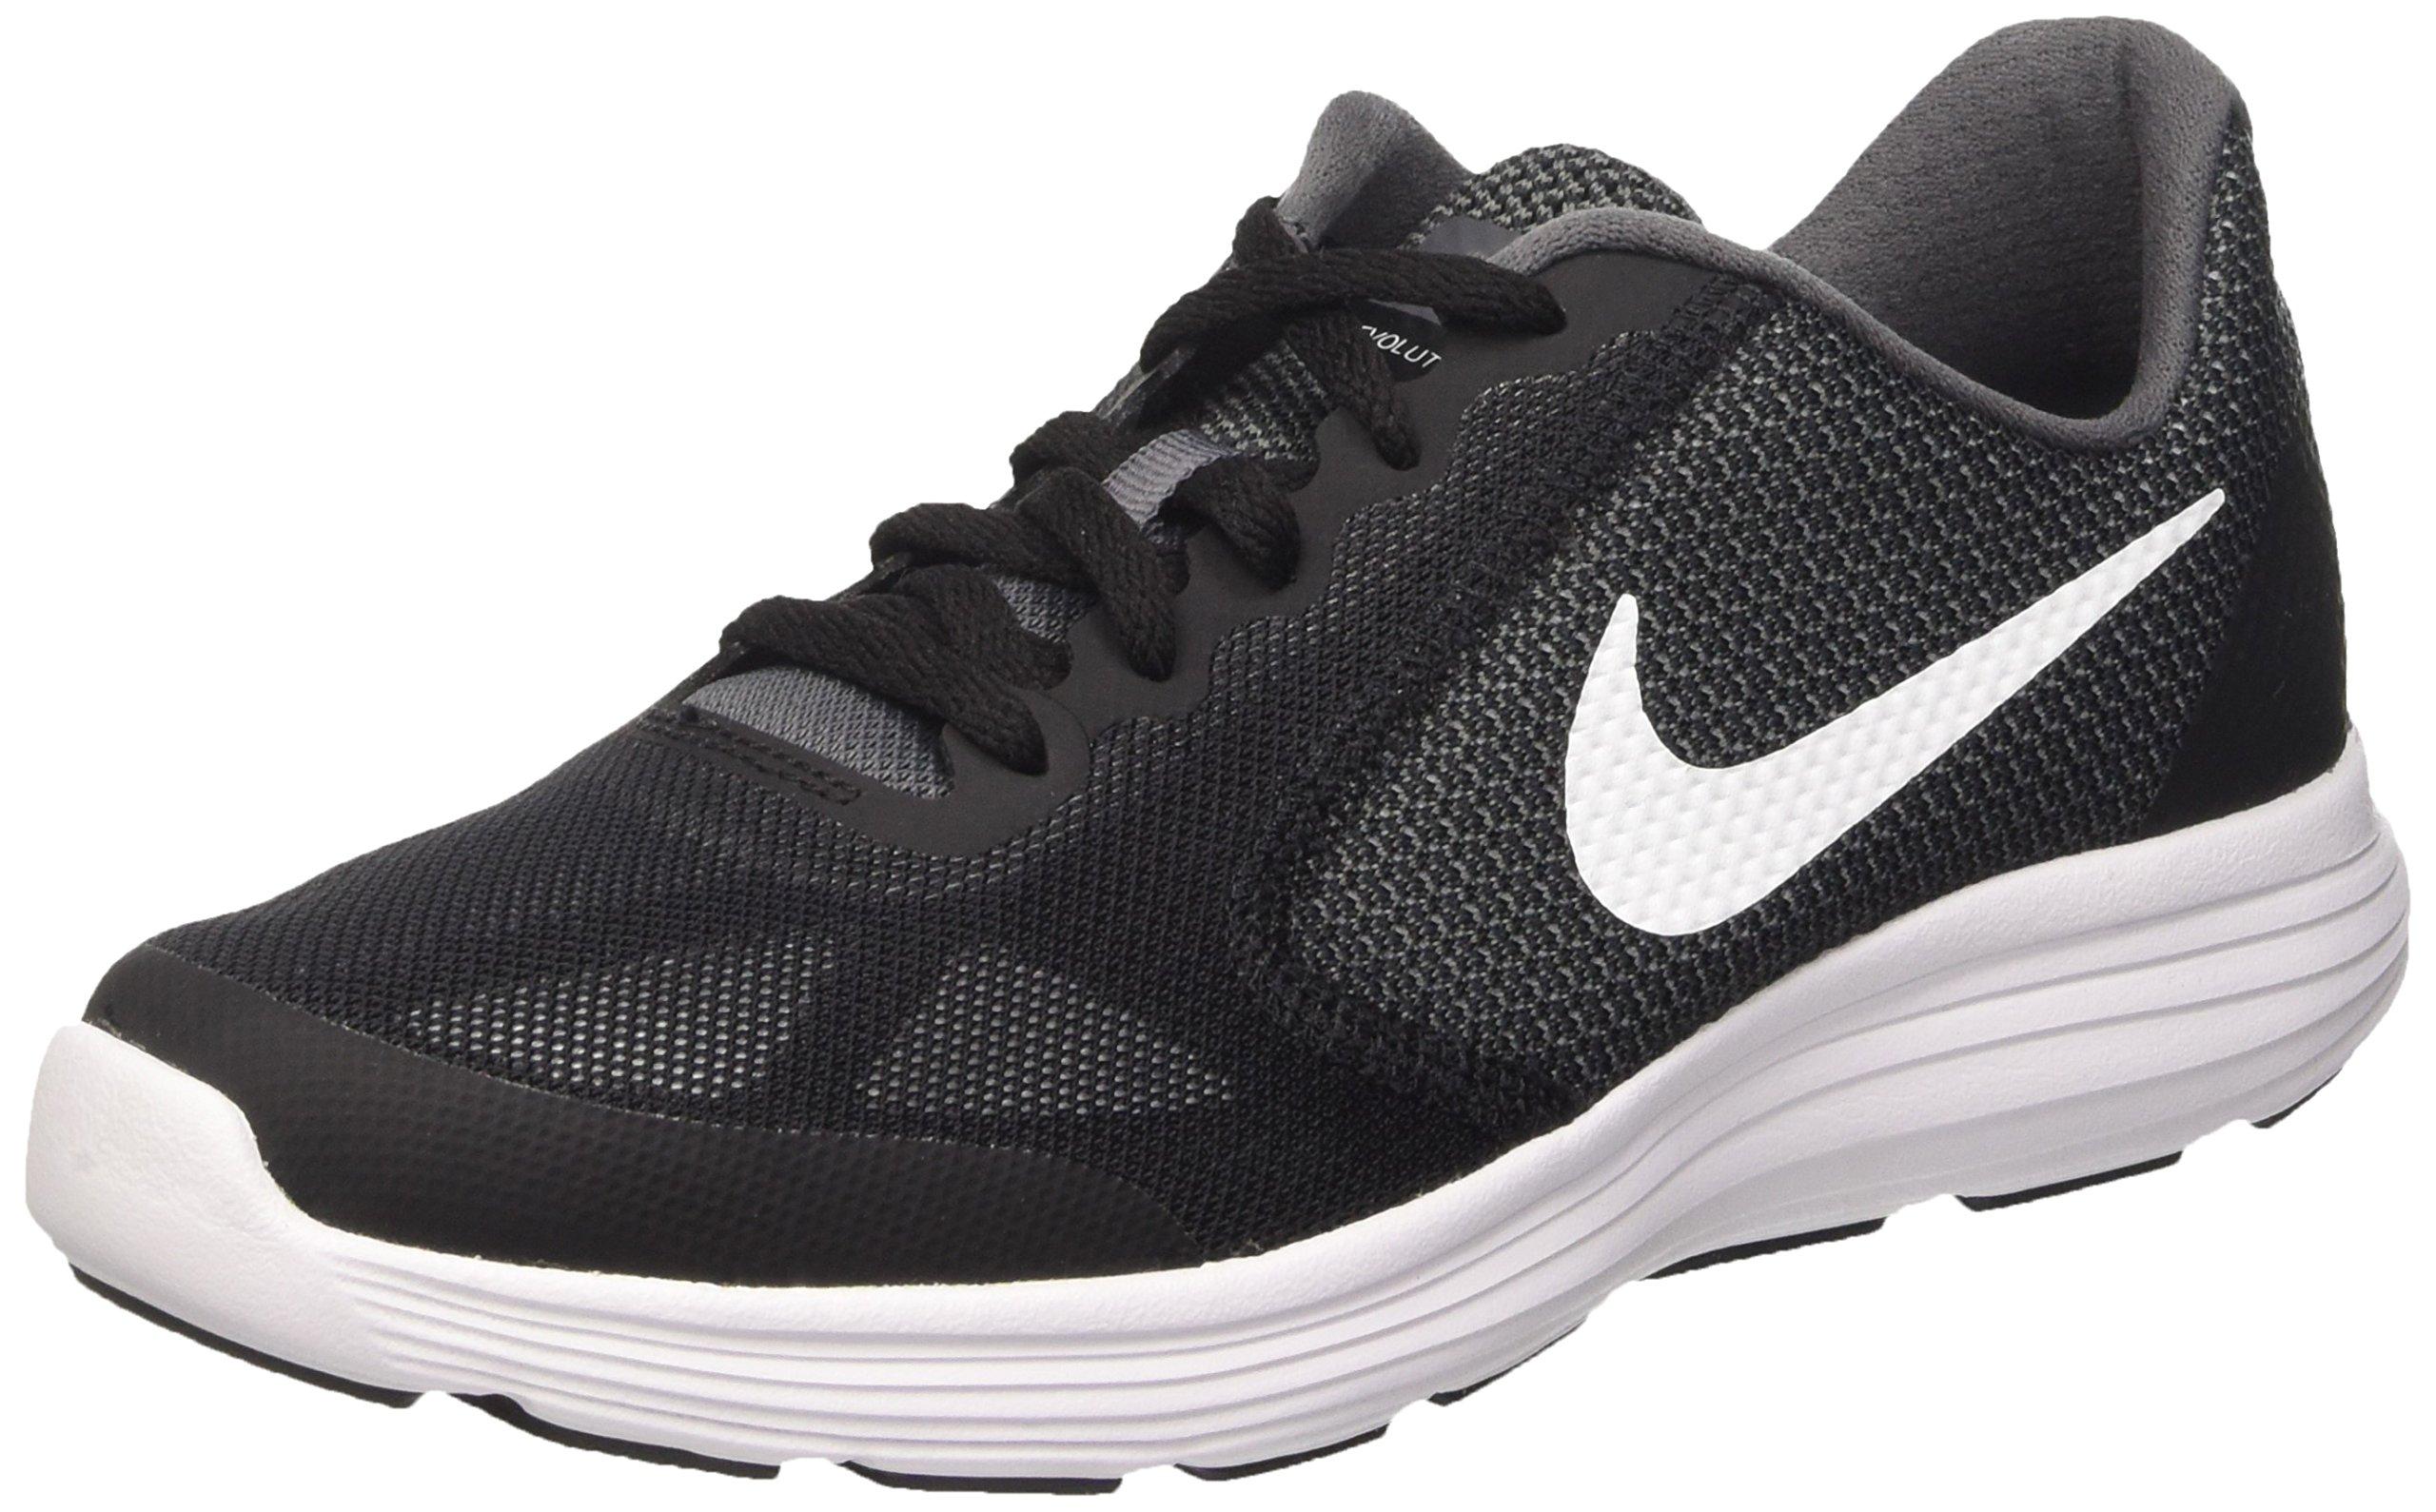 NIKE Boy's Revolution 3 (GS) Athletic Shoe, Dark Grey/White-Black-Pure Platinum, 3.5 M US Big Kid by NIKE